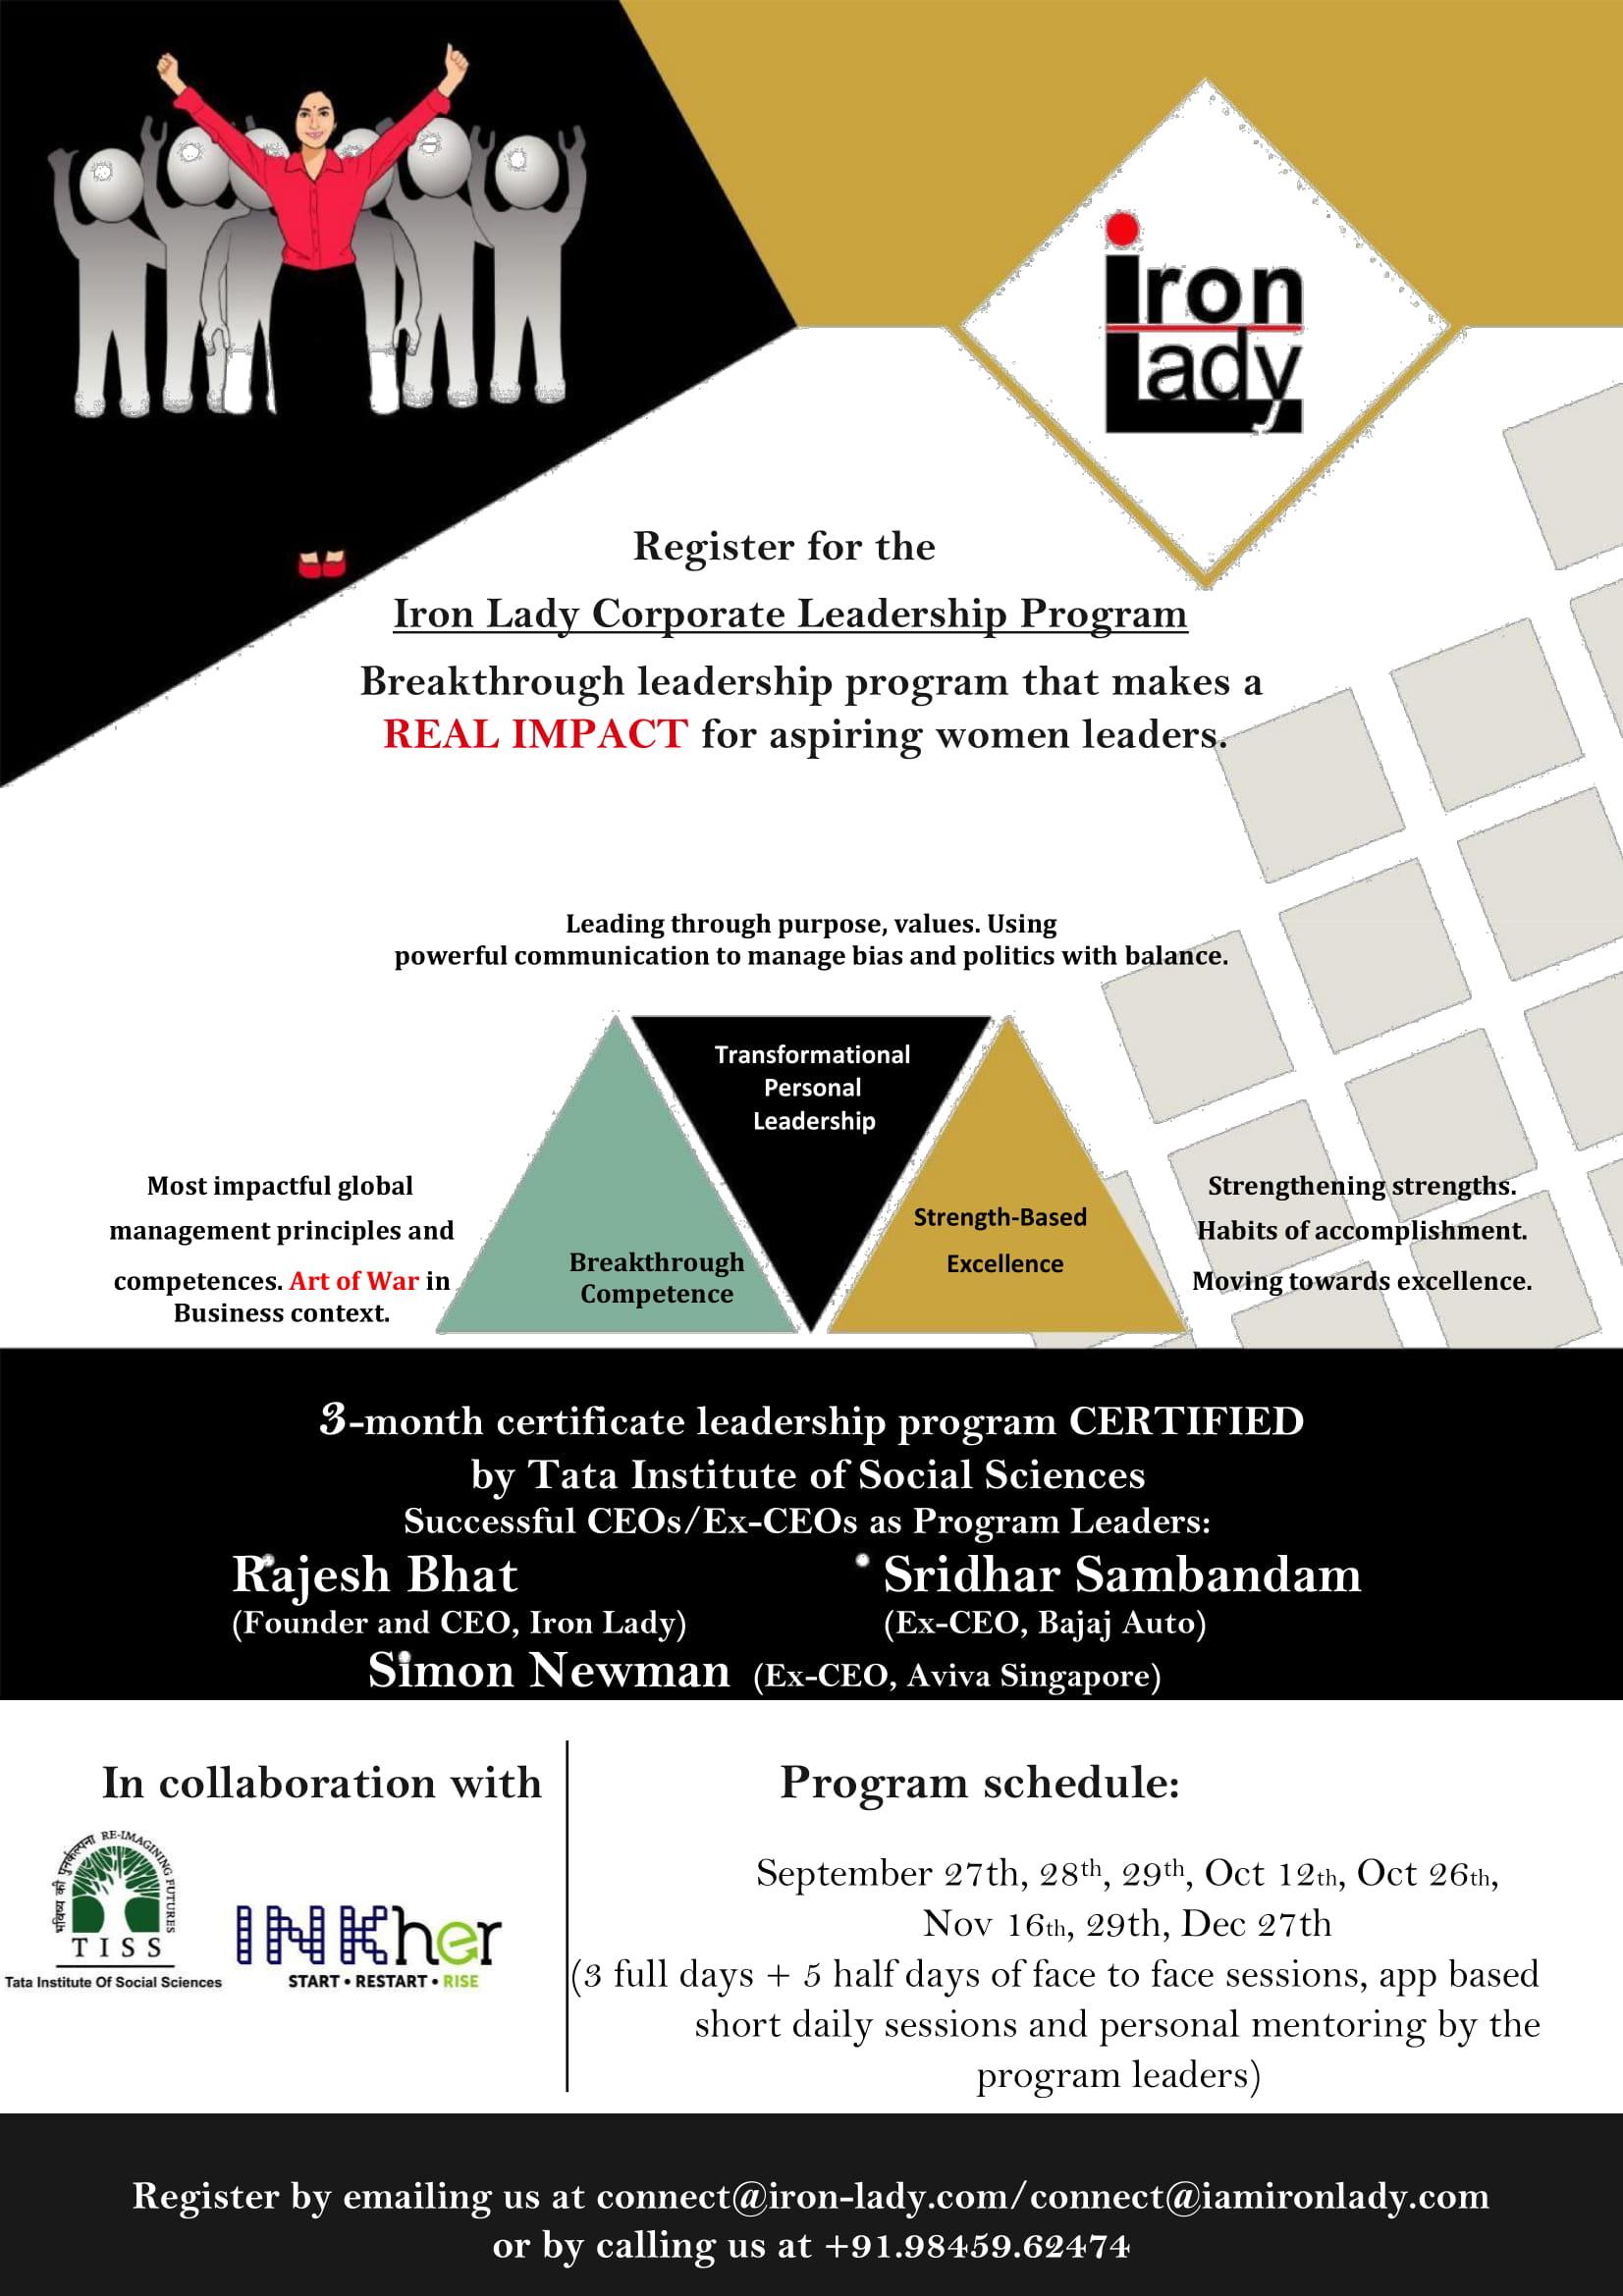 iron-lady-leadership-program